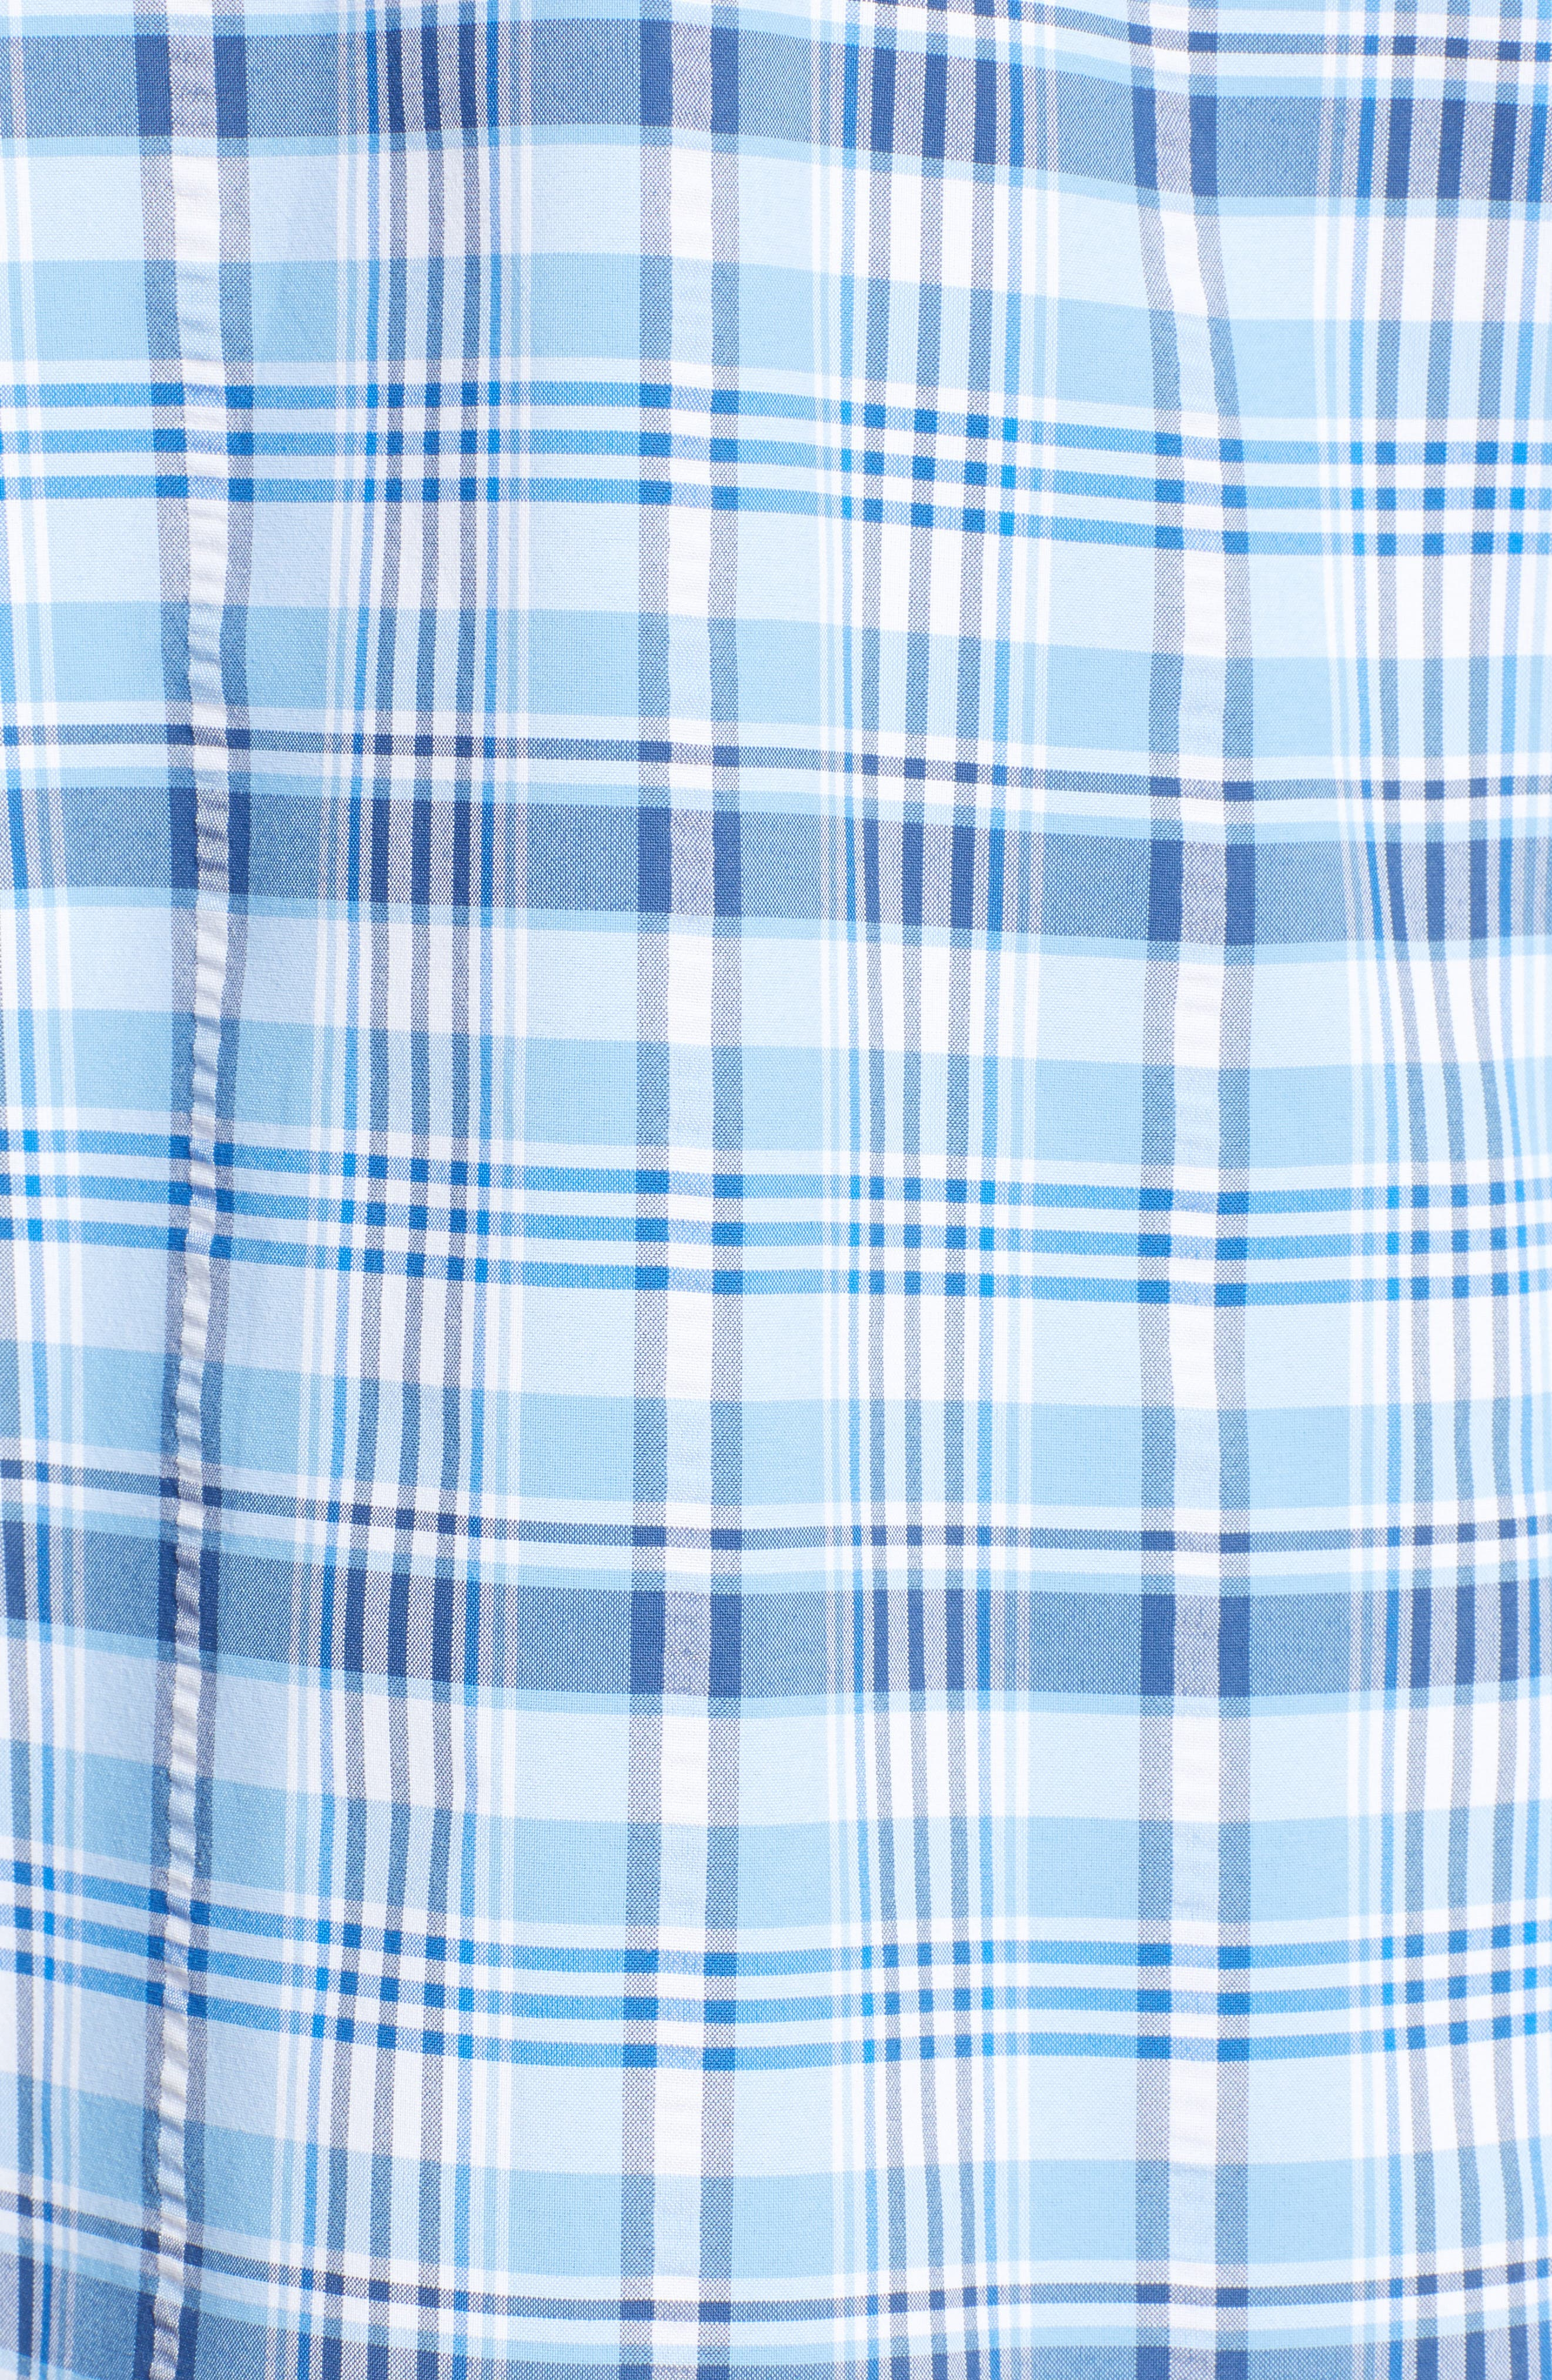 Prospect Hill Harbor Regular Fit Plaid Performance Sport Shirt,                             Alternate thumbnail 5, color,                             484